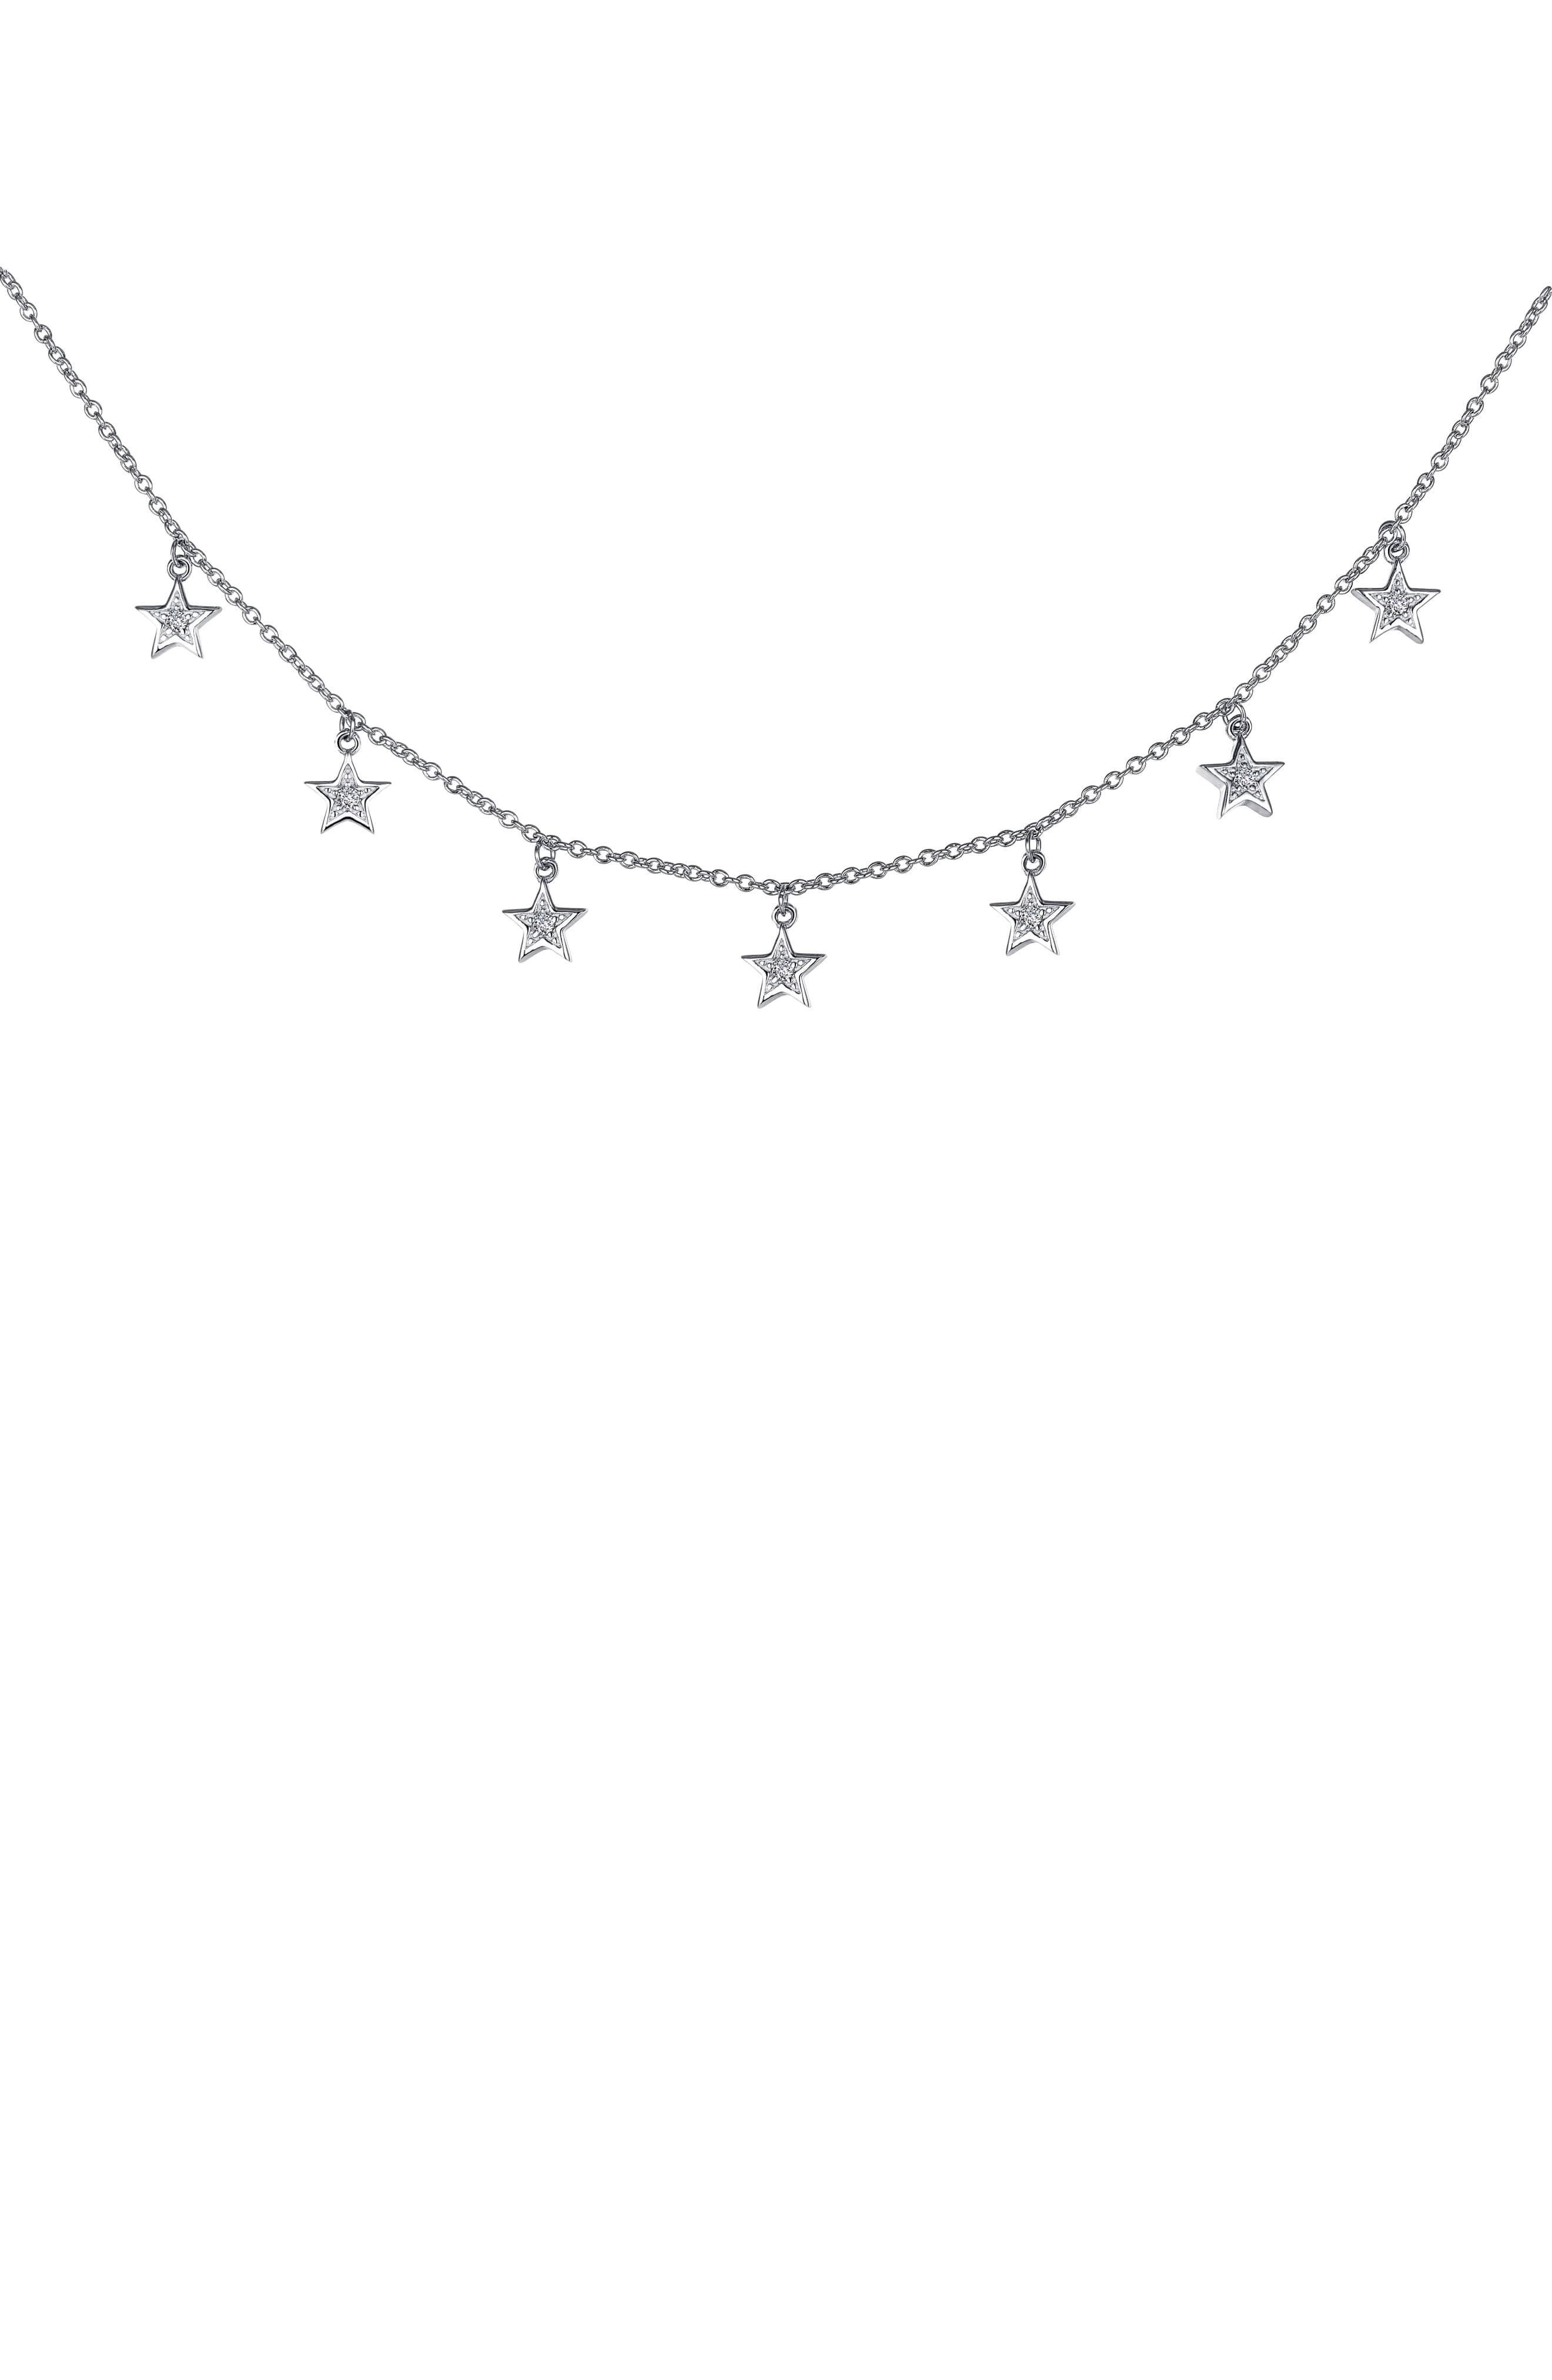 Lafonn 7 Symbols Of Joy Charm Necklace Nordstrom Charm Necklace Necklace Jewelry